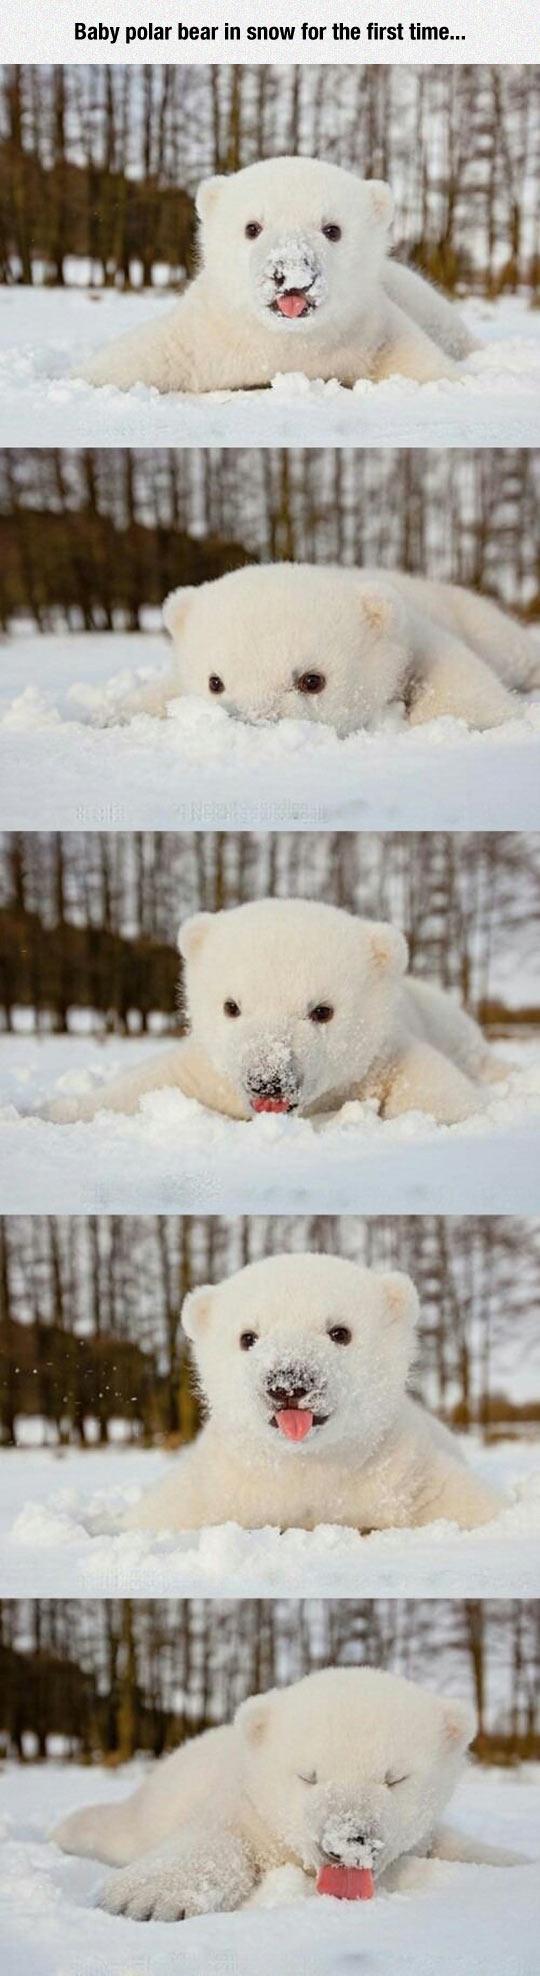 cool-bear-polar-baby-snow-first-time